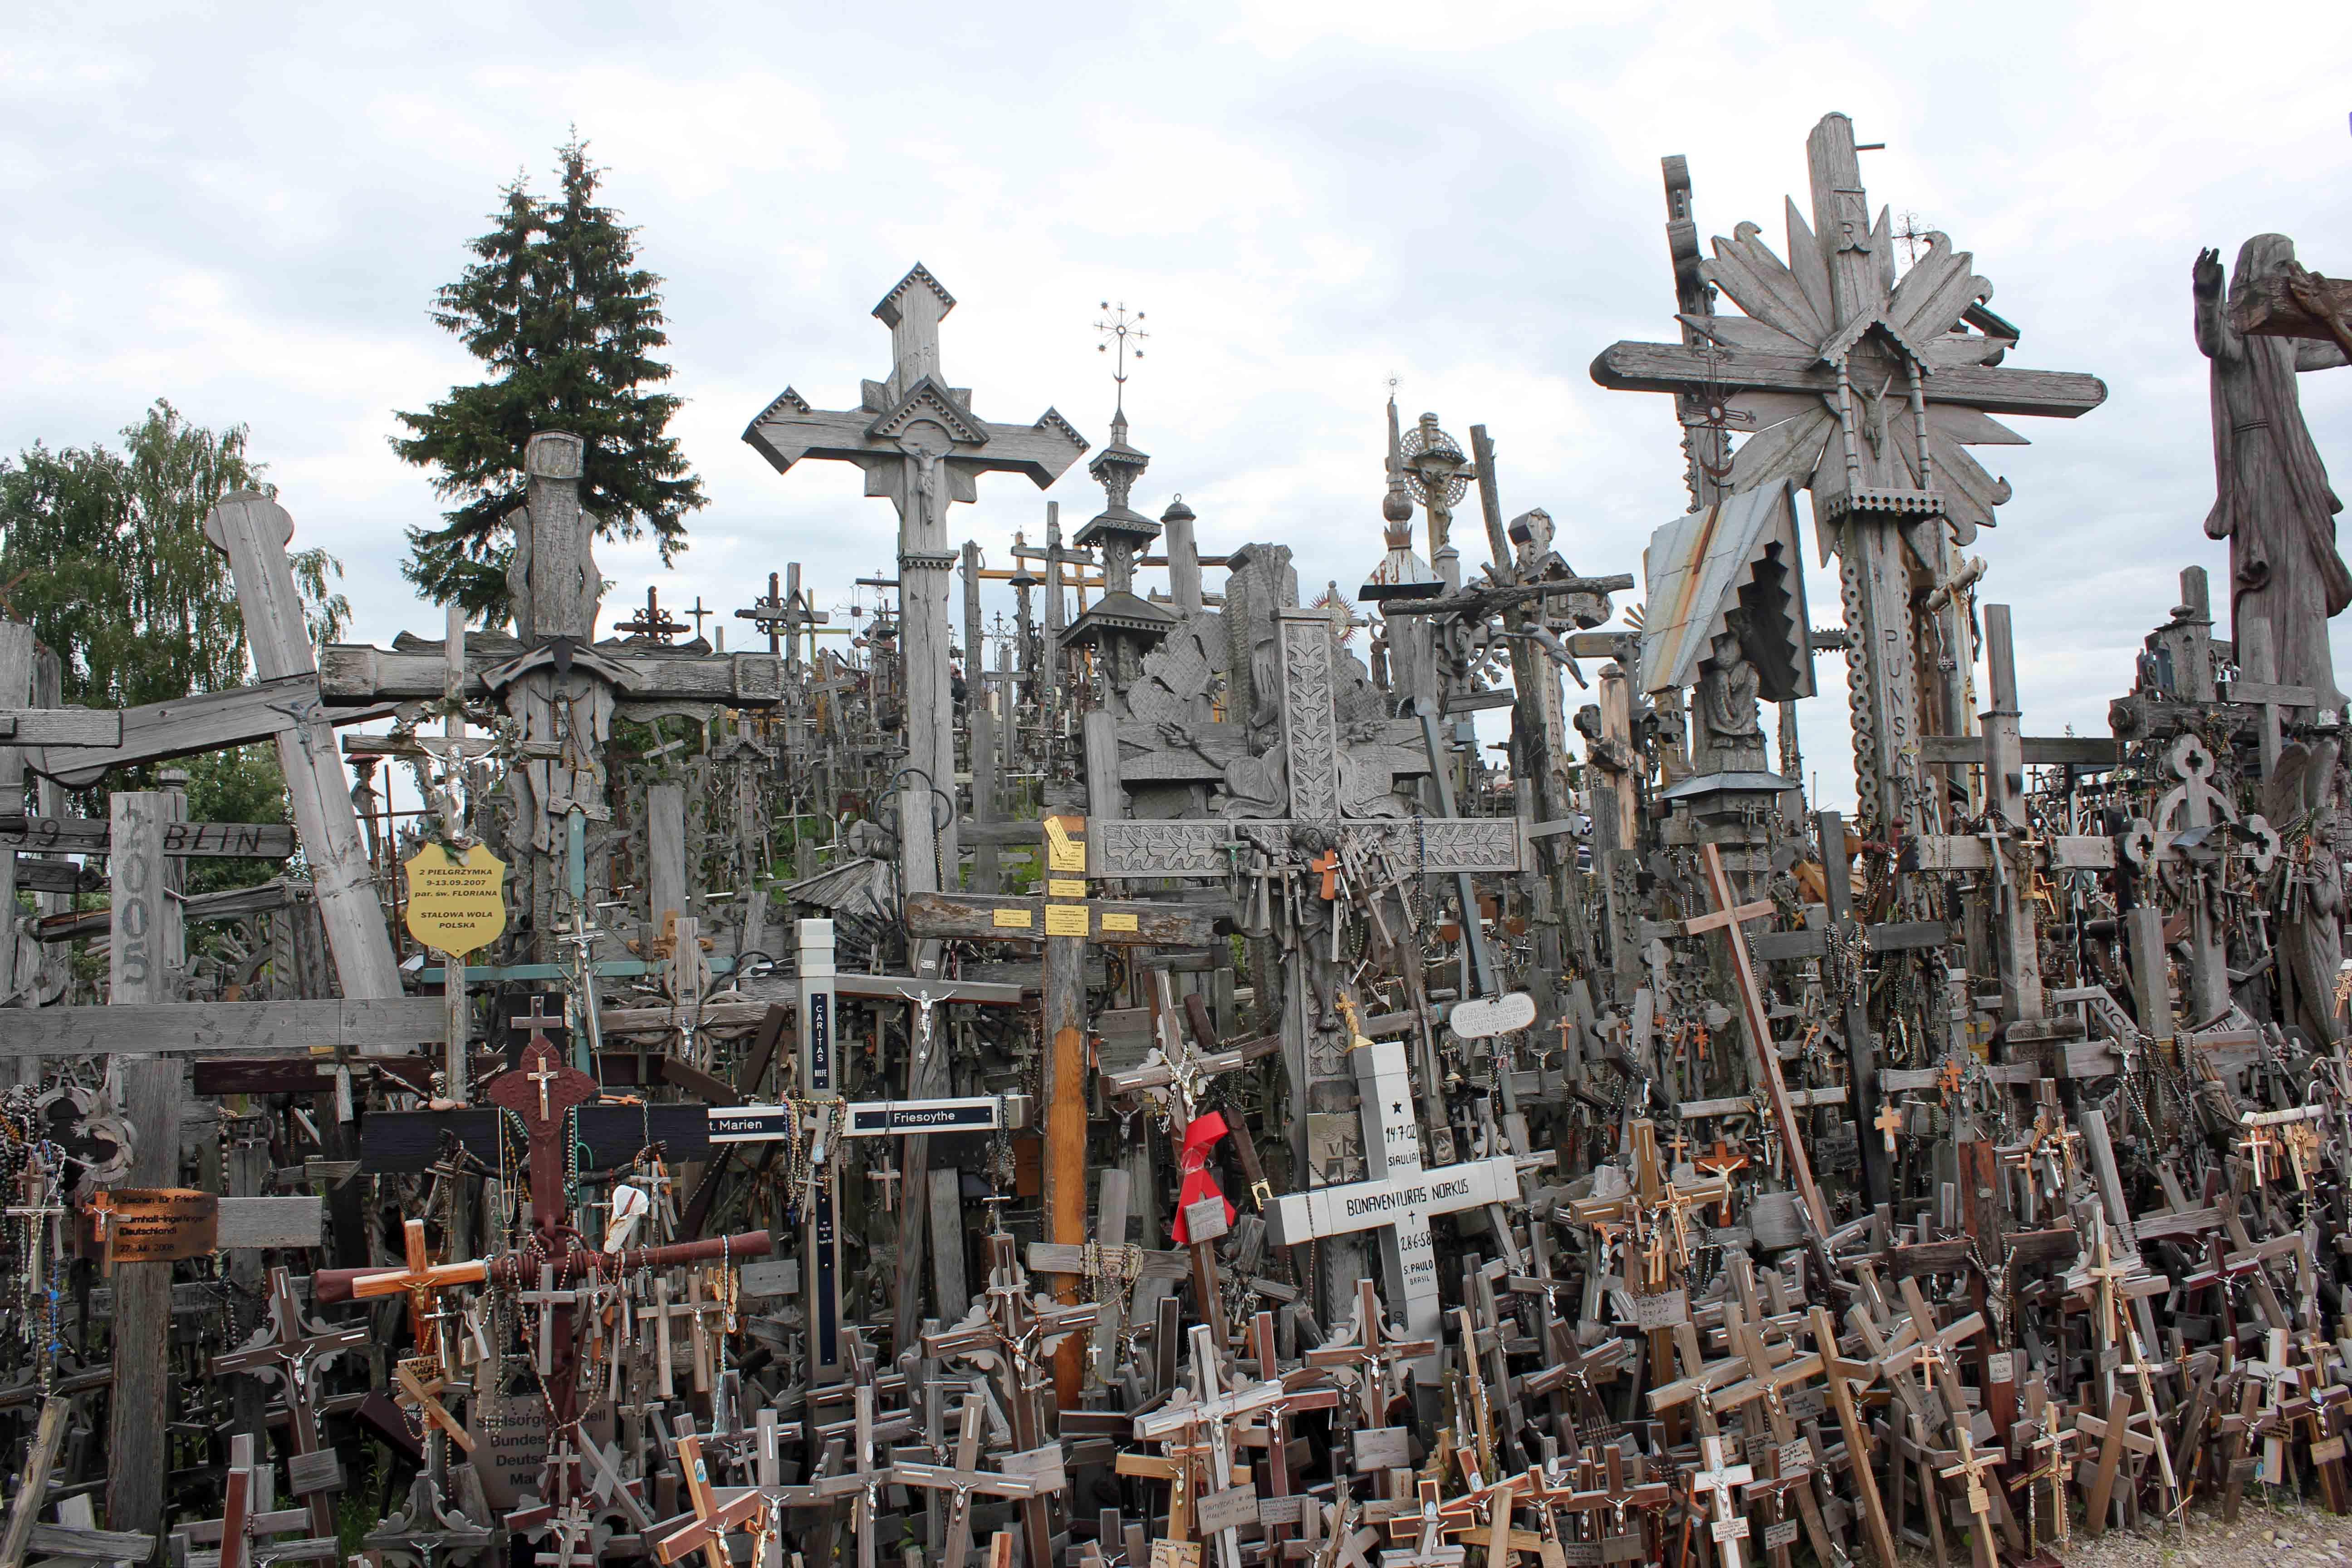 En bakke i Litauen fyldt med kors og krucifikser